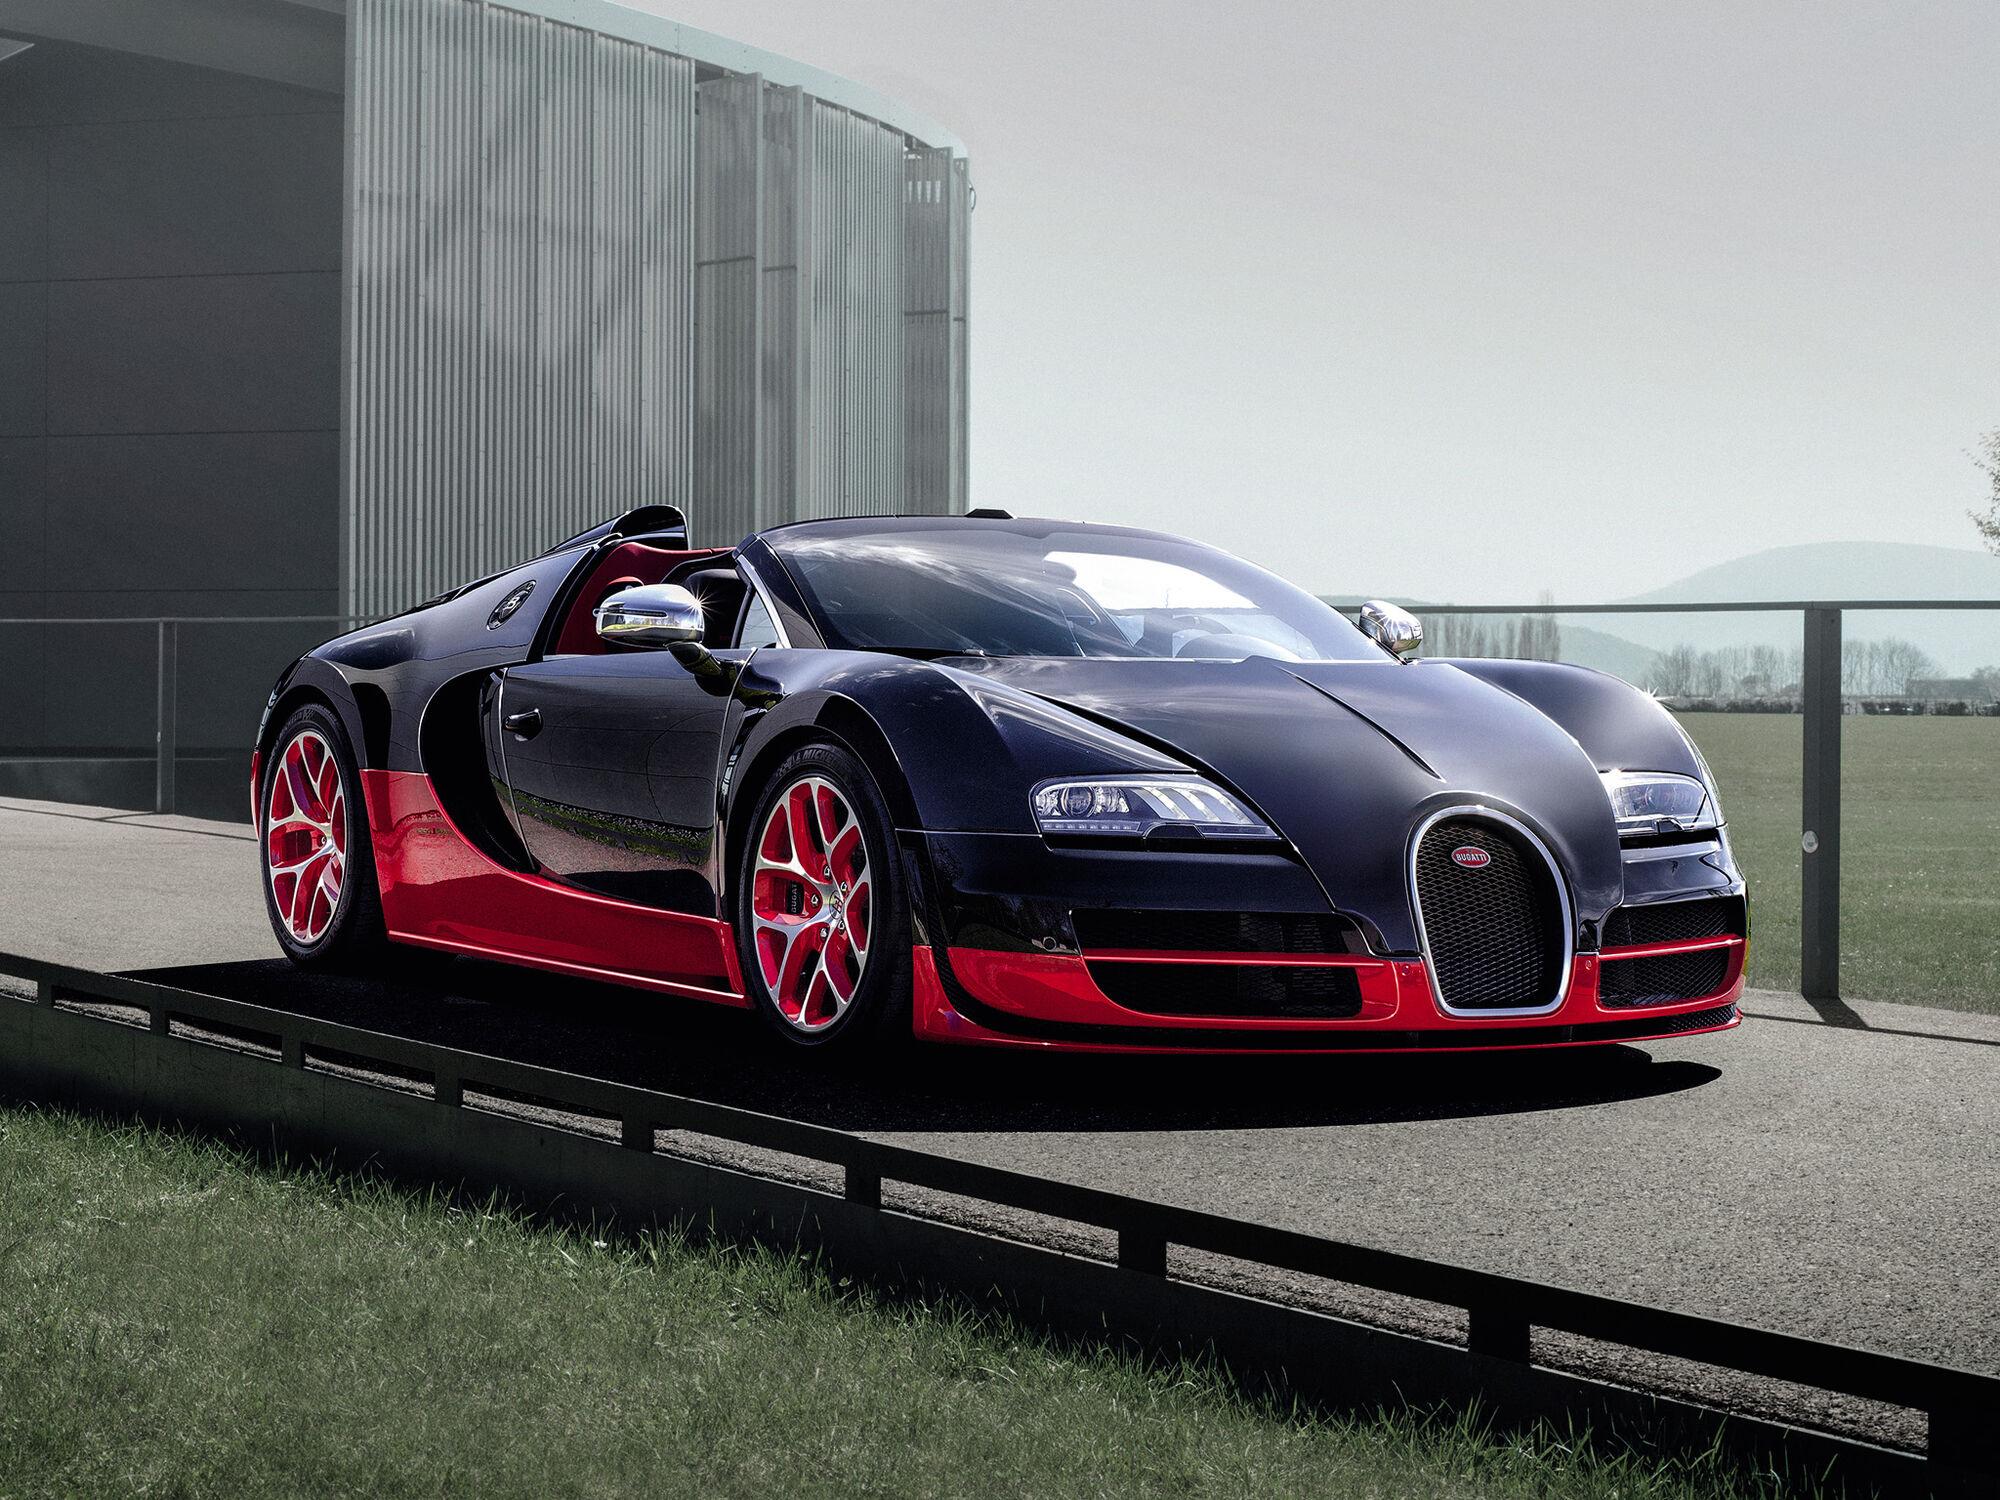 2000?cb=20150324055015 Extraordinary Bugatti Veyron Grand Sport Vitesse Real Racing 3 Cars Trend